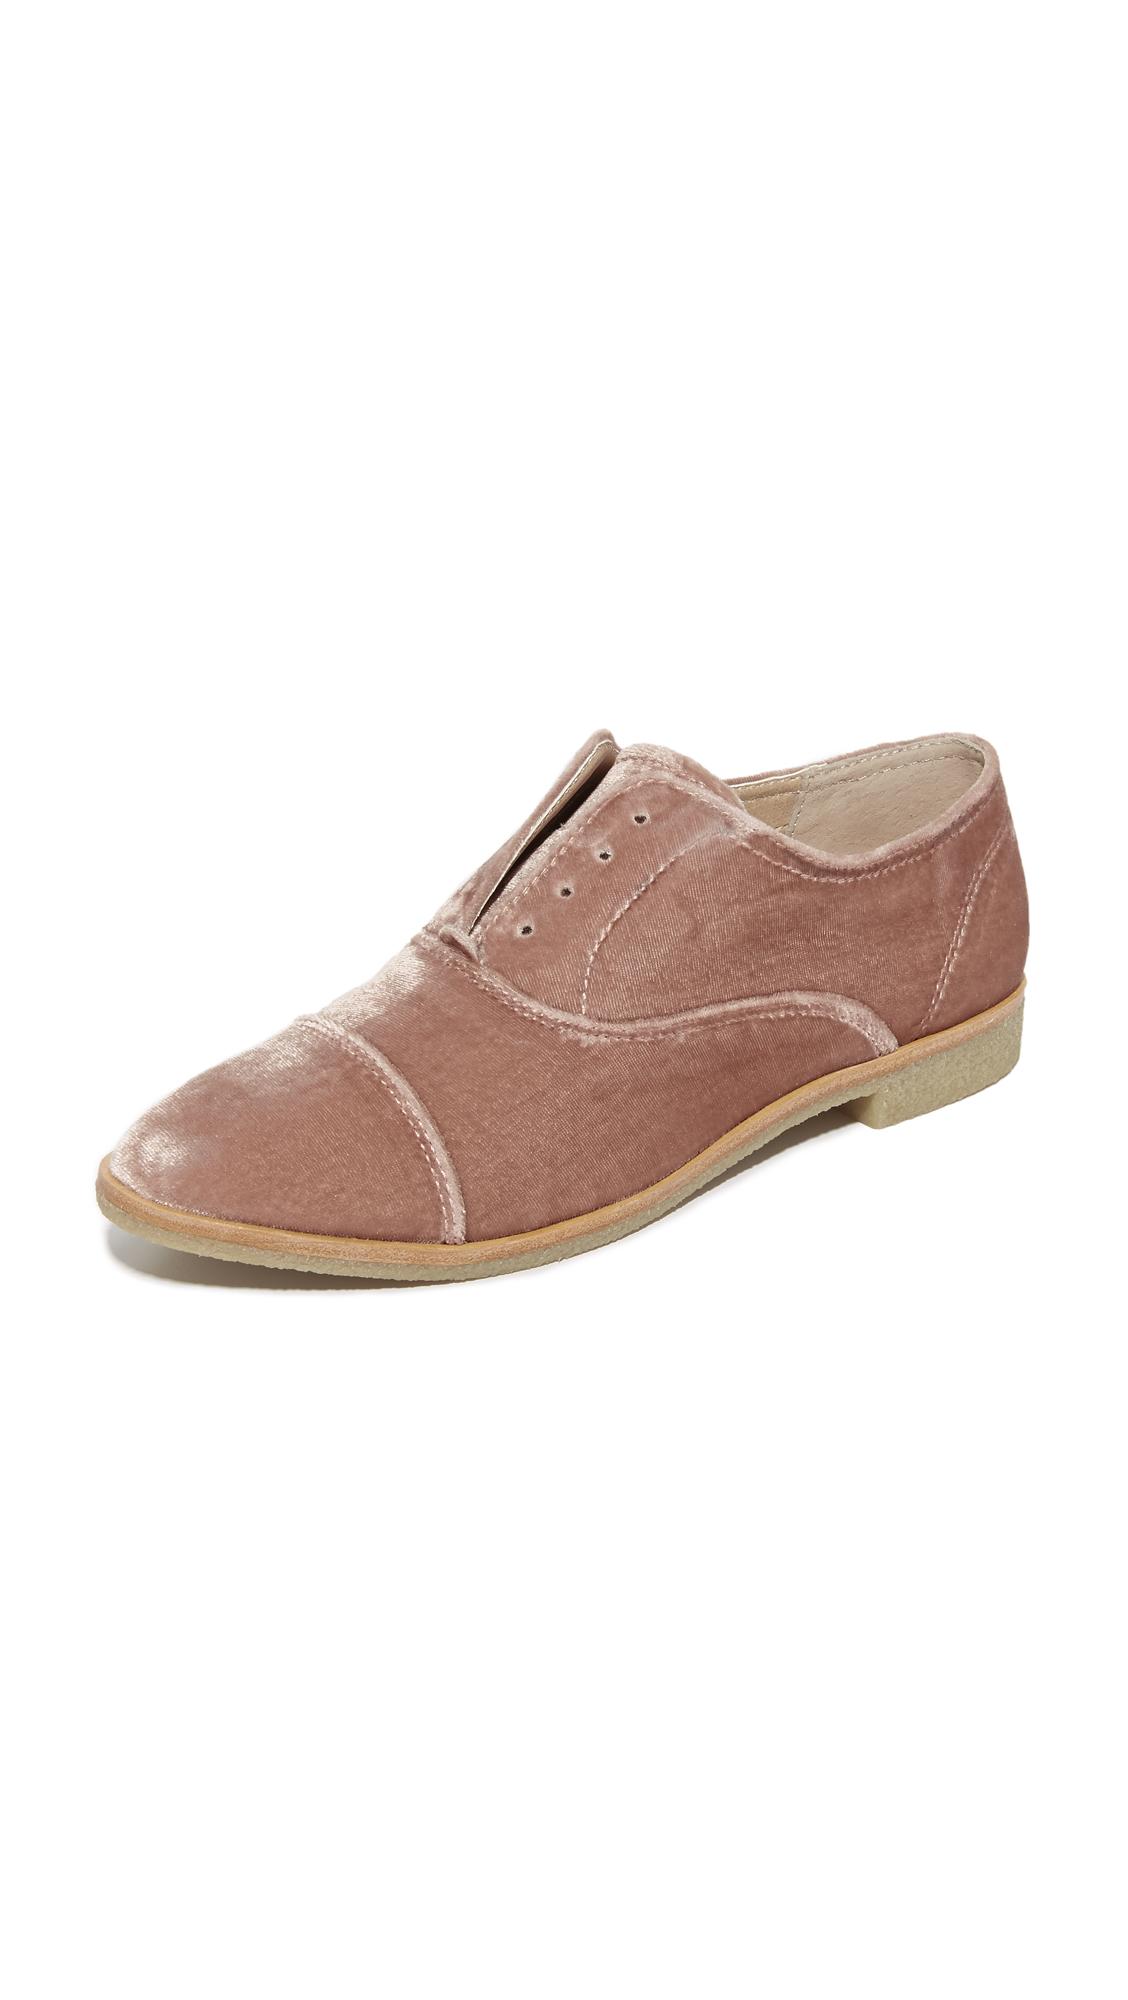 Dolce Vita Cooper Velvet Oxfords - Rose at Shopbop